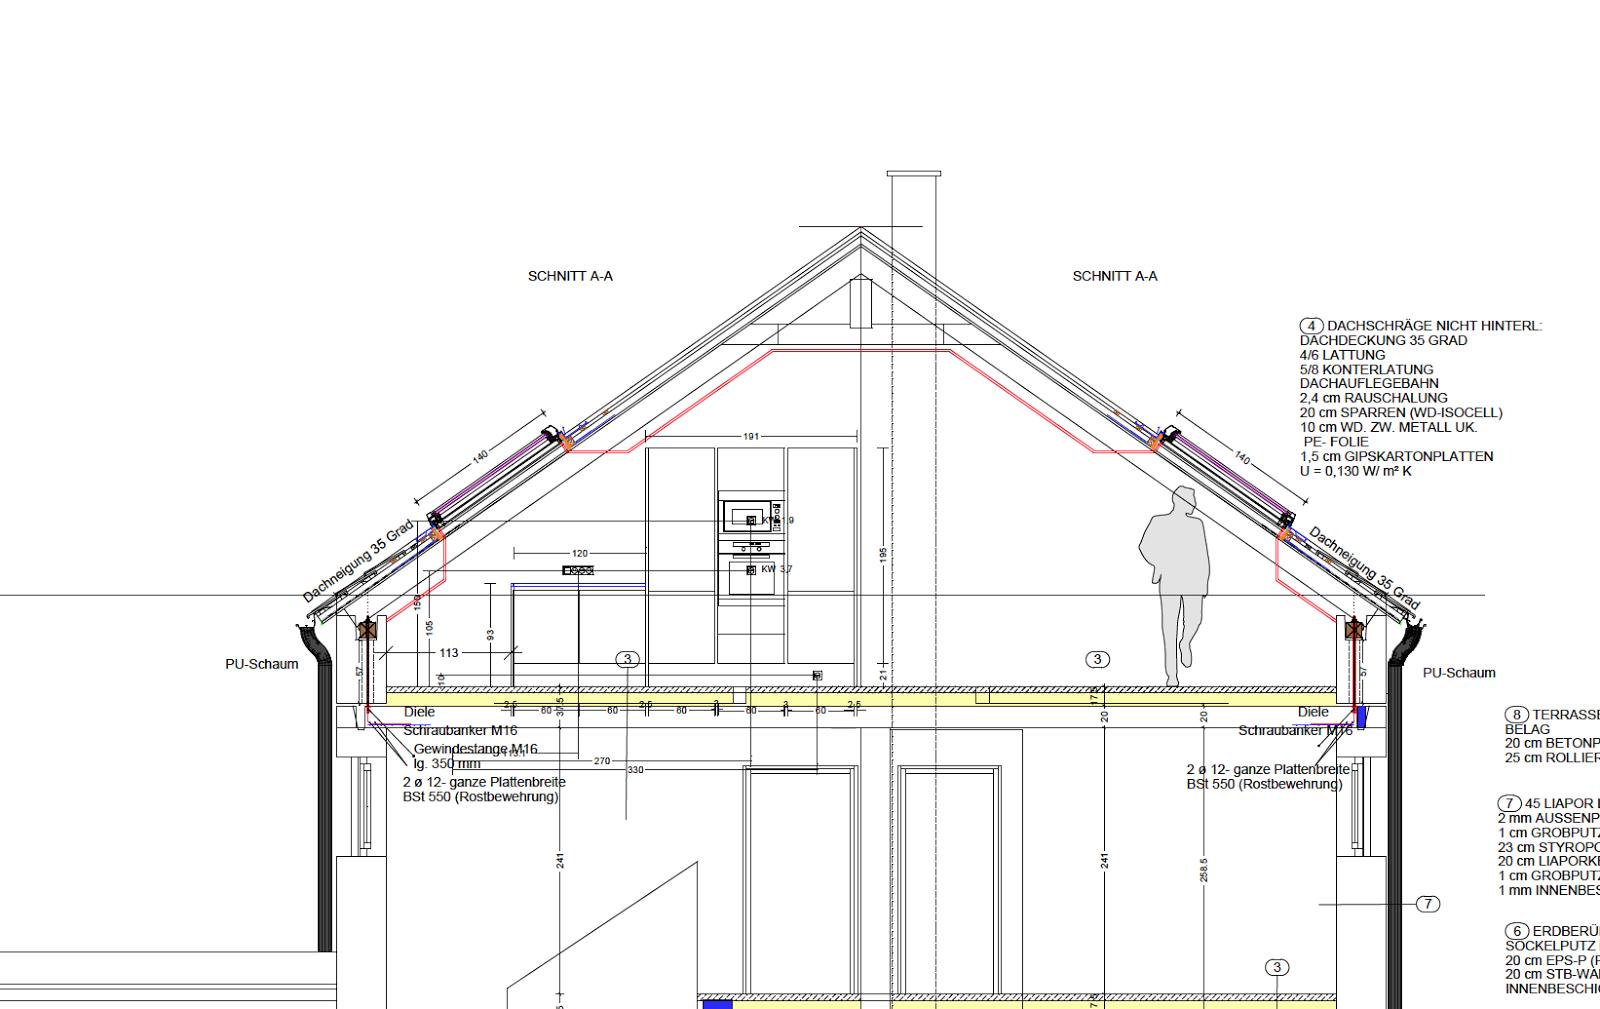 unser romberger liaporhaus das dachgeschoss mit der dachterrasse. Black Bedroom Furniture Sets. Home Design Ideas